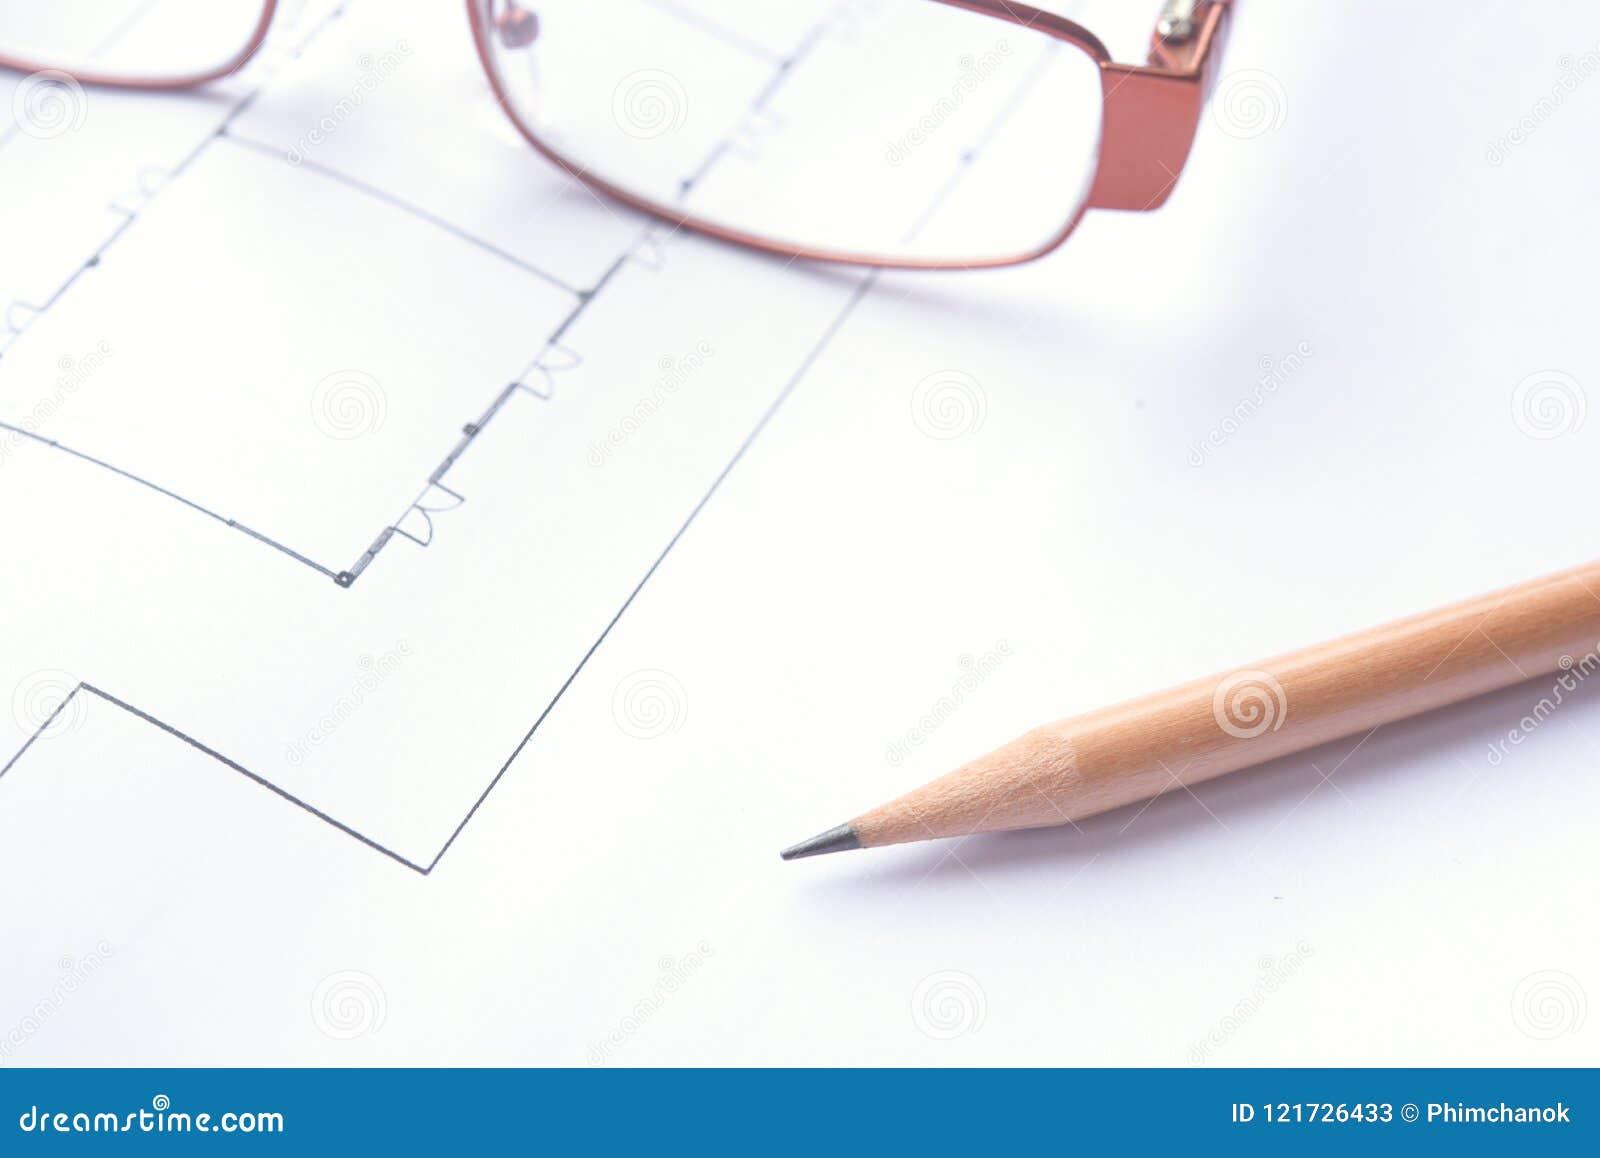 Practical drawing sketch